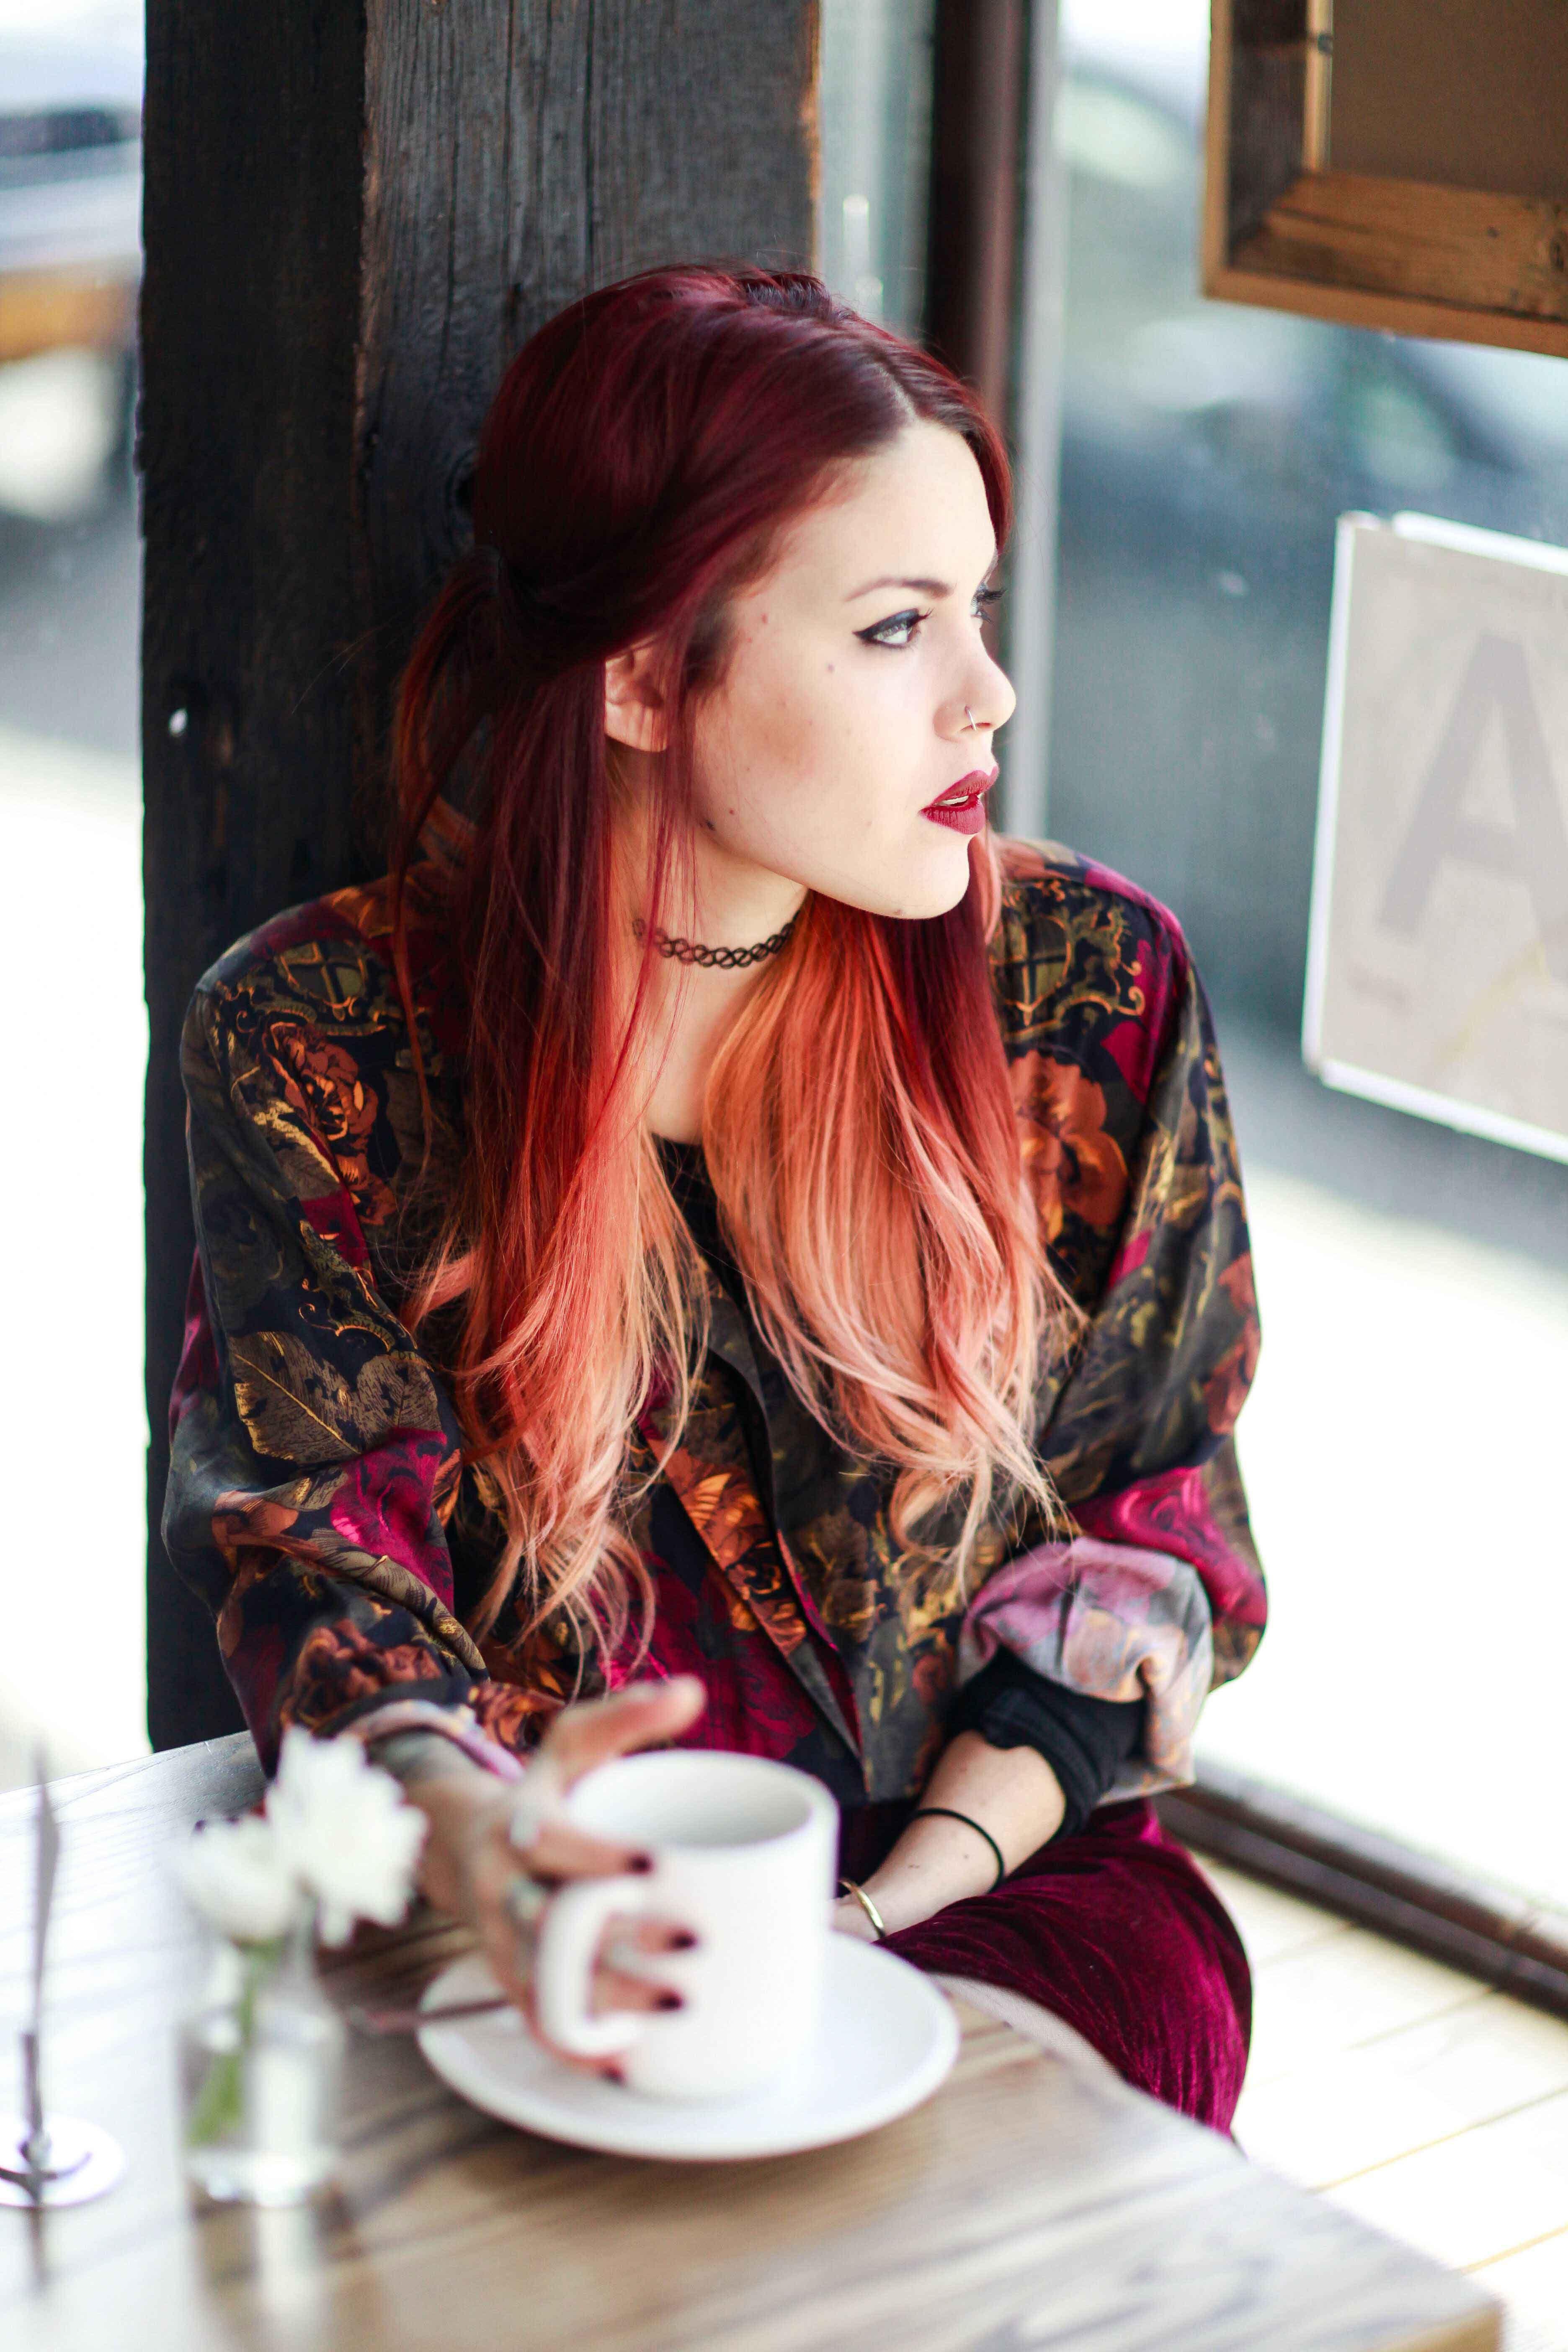 mg 2289 red heads rock pinterest haarfarben kaffeepause und haar ideen. Black Bedroom Furniture Sets. Home Design Ideas